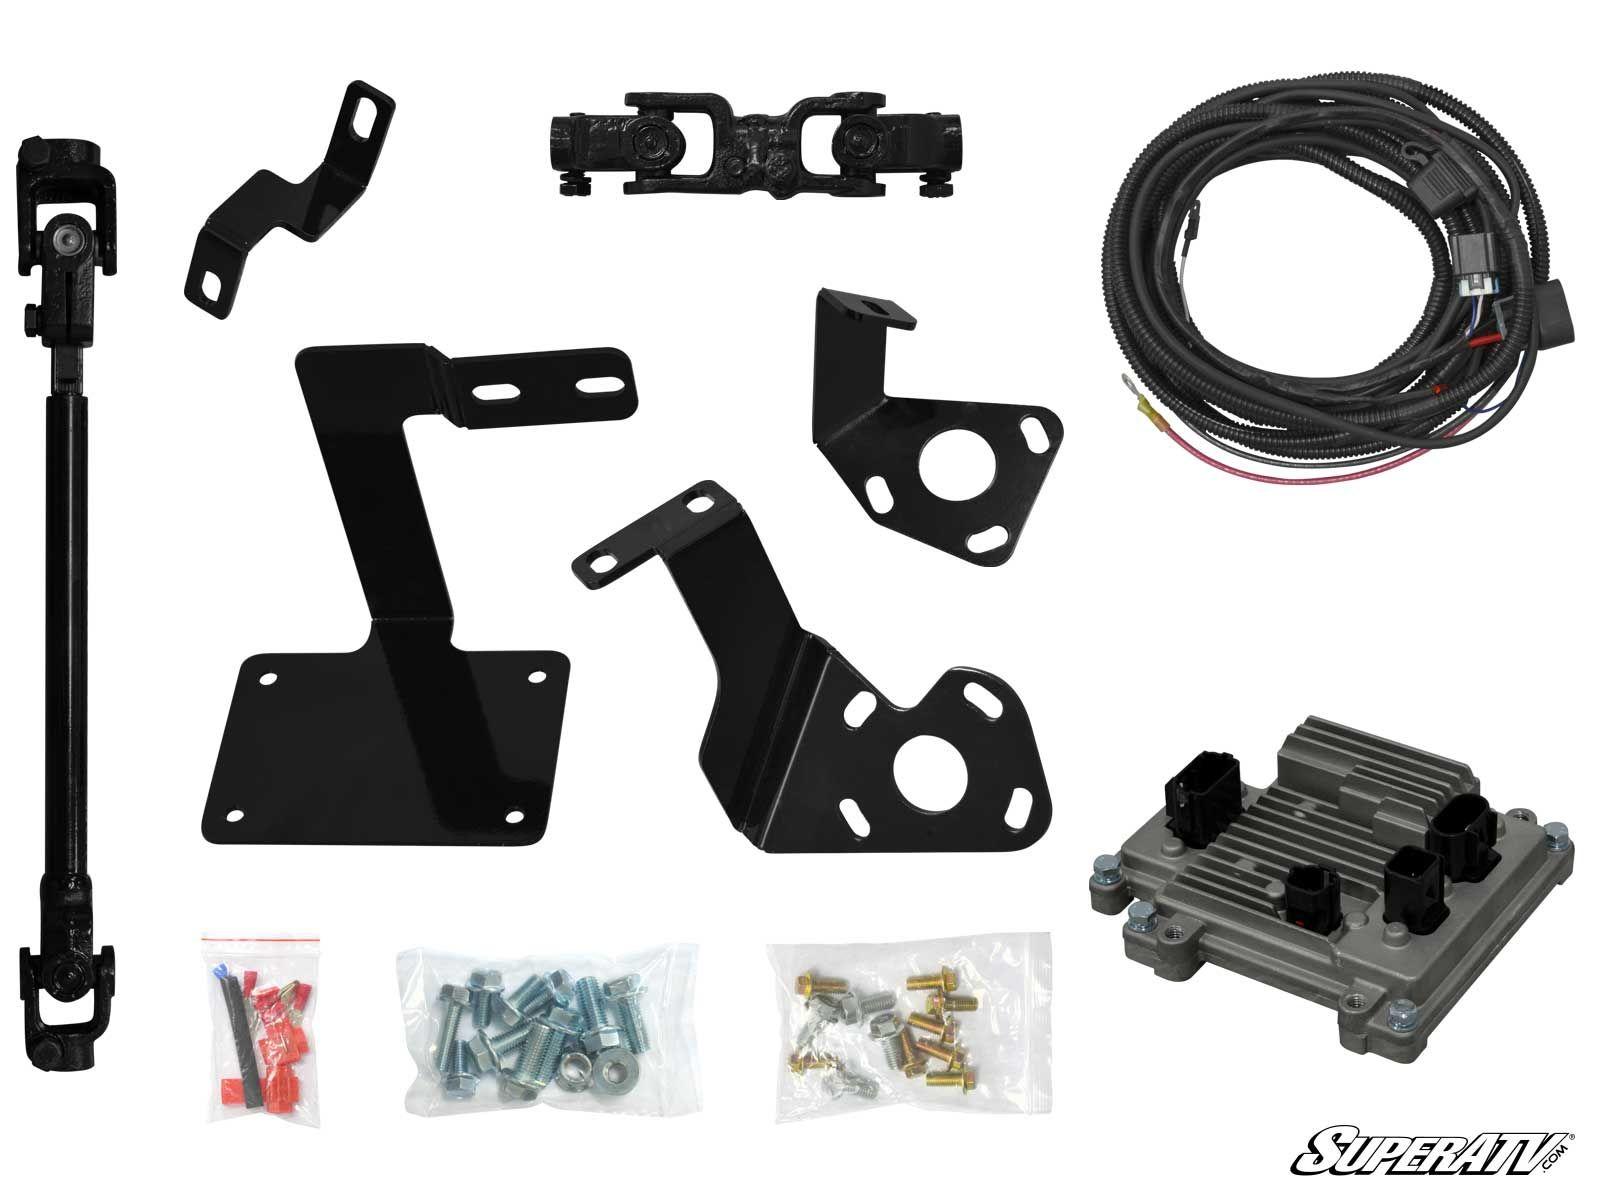 Super ATV Power Steering Kit for Kawasaki Mule Pro Models